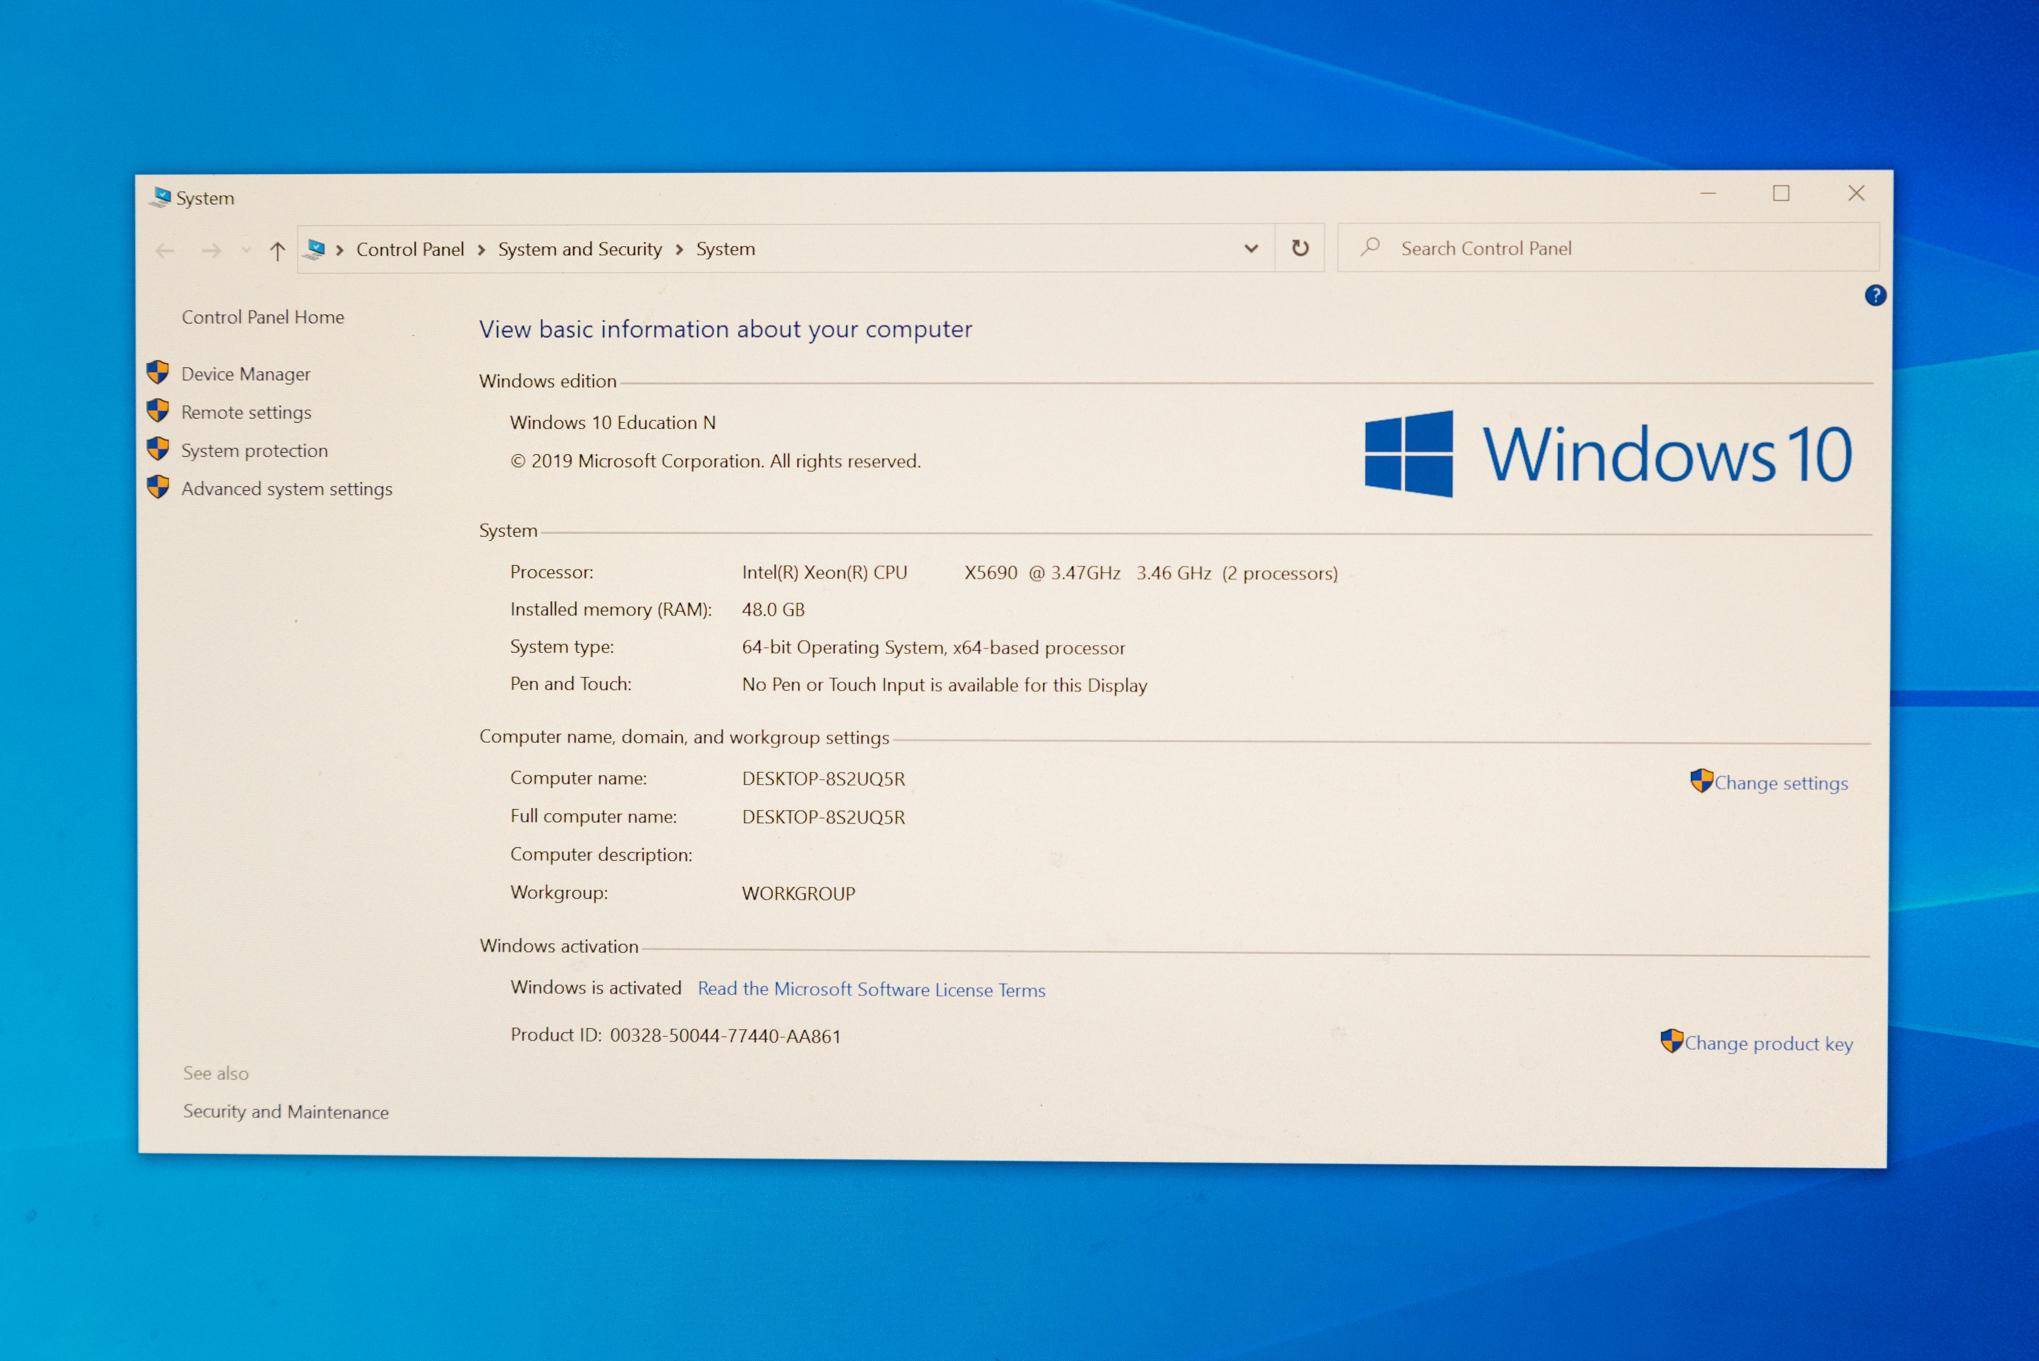 Z800 system information under Windows 10 Education